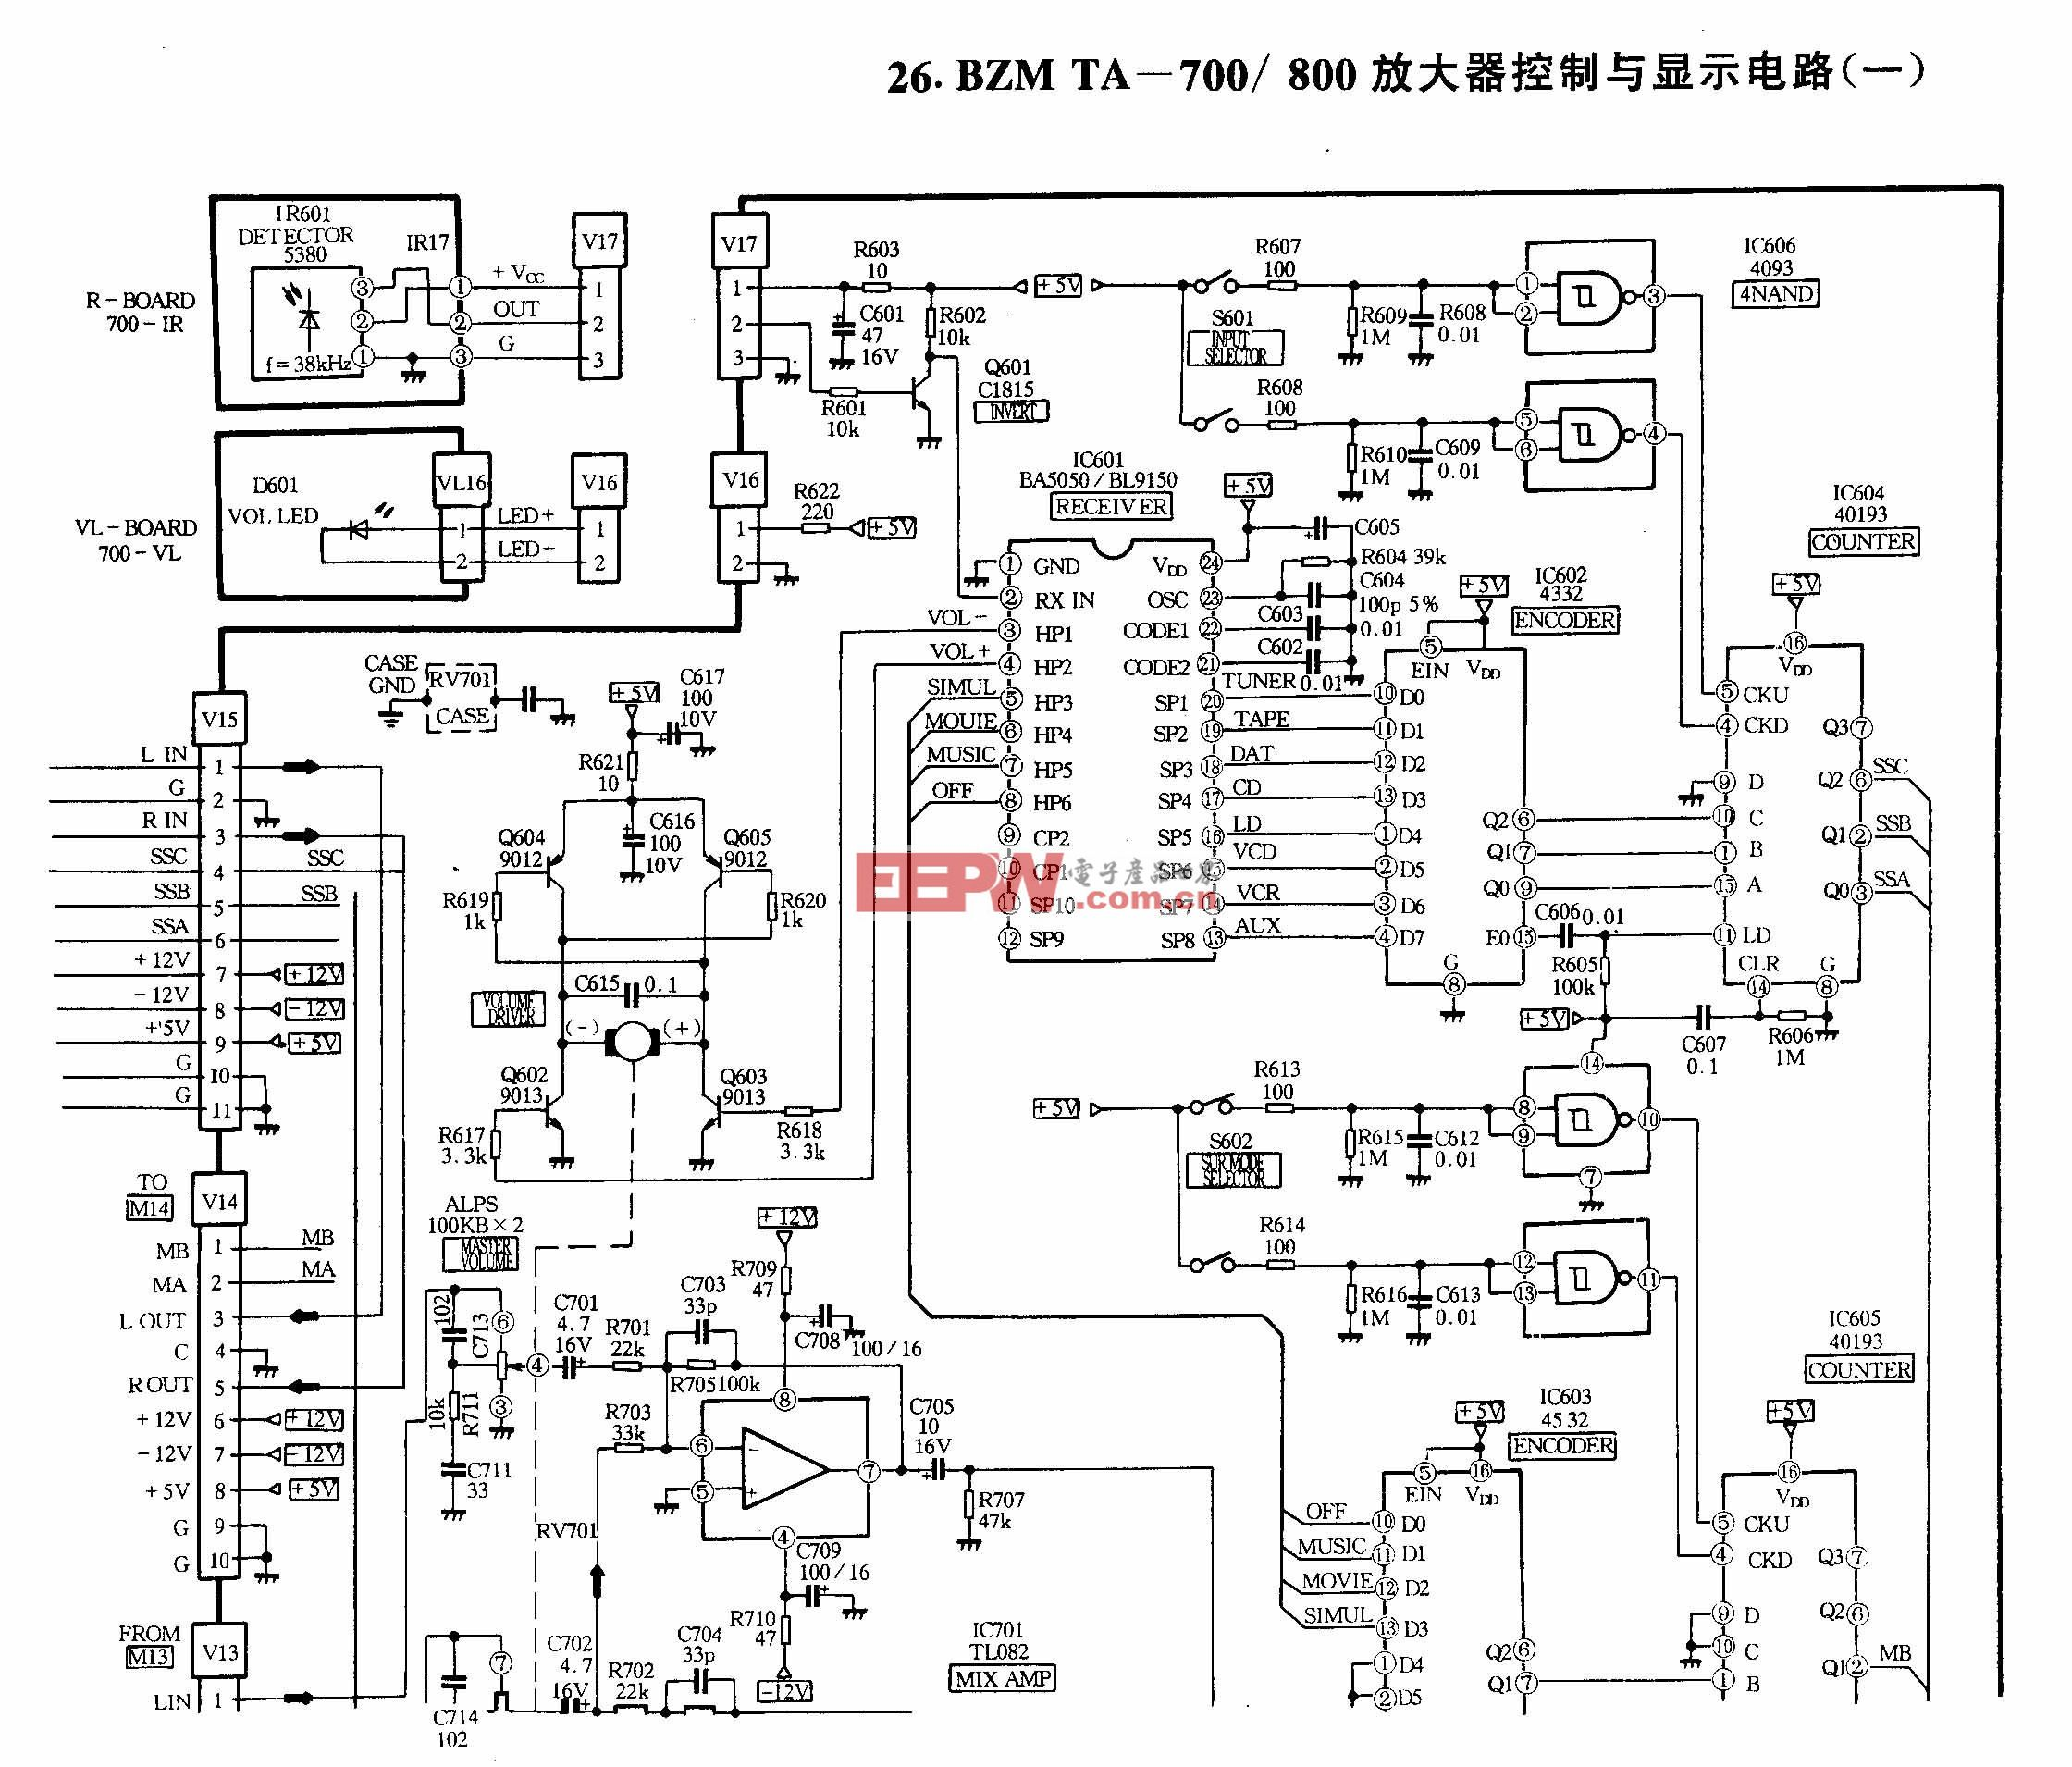 BZMTA-700/800放大器控制与显示电路(一)